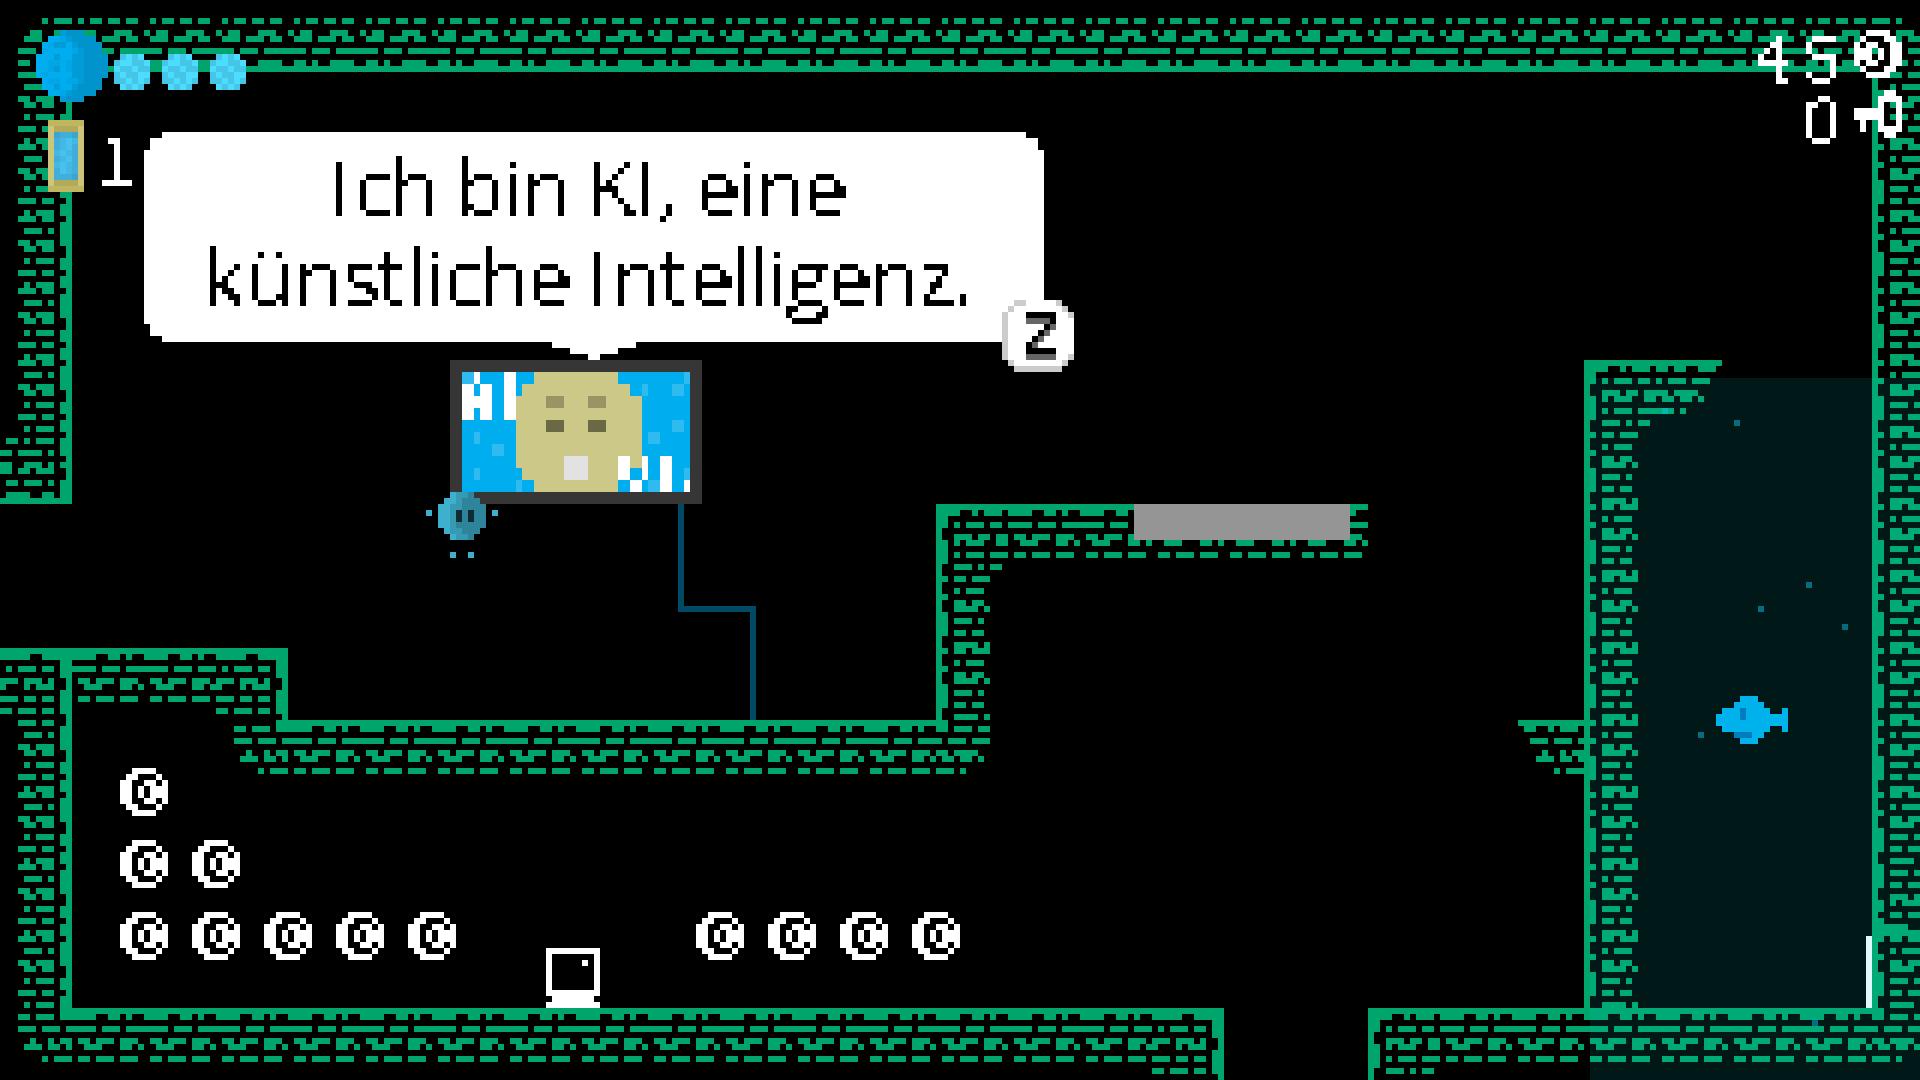 ss german translation